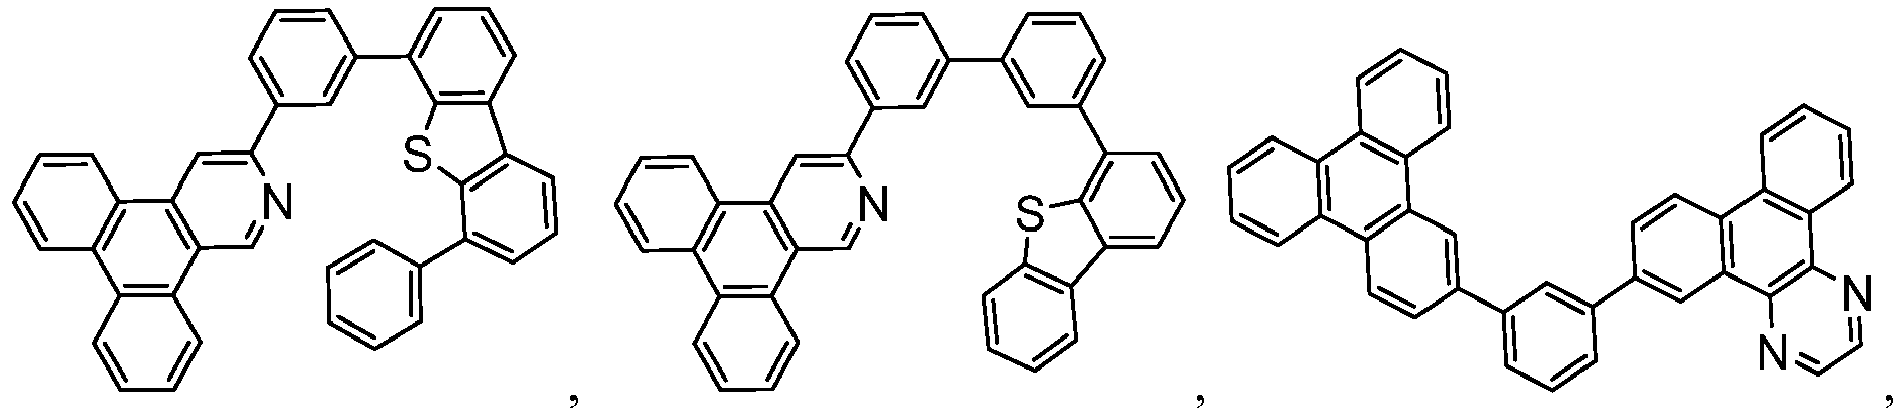 Figure imgb0884